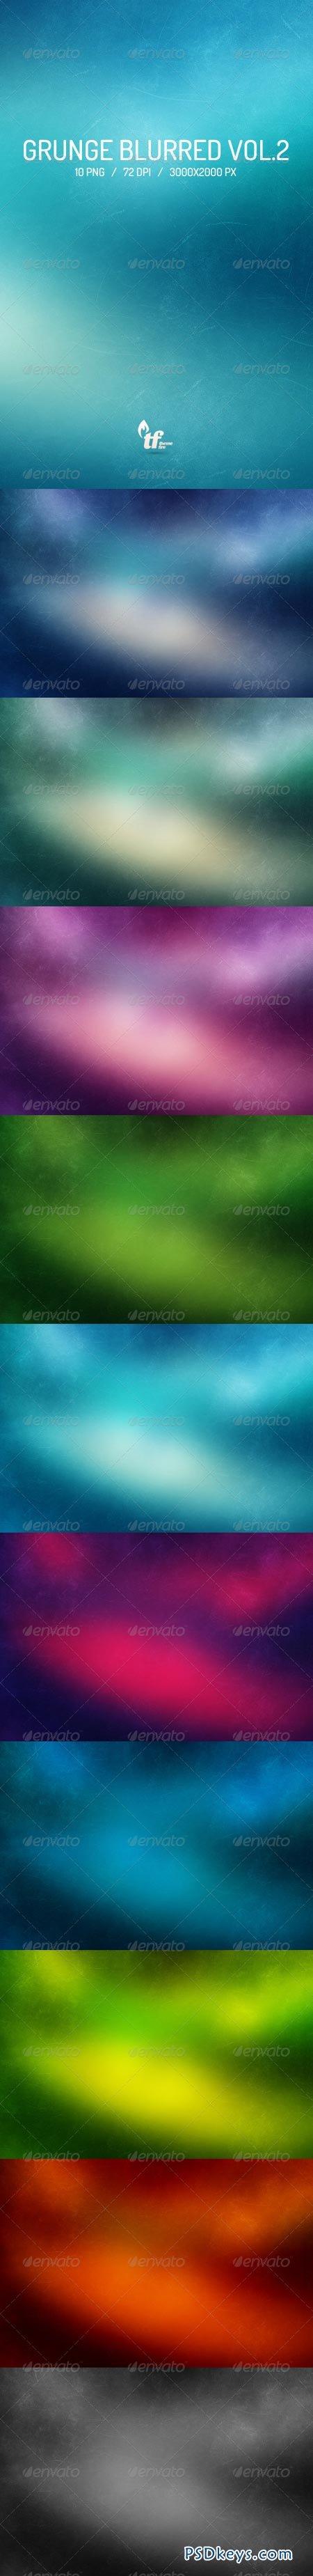 10 Grunge Blurred Backgrounds Vol.2 6869668